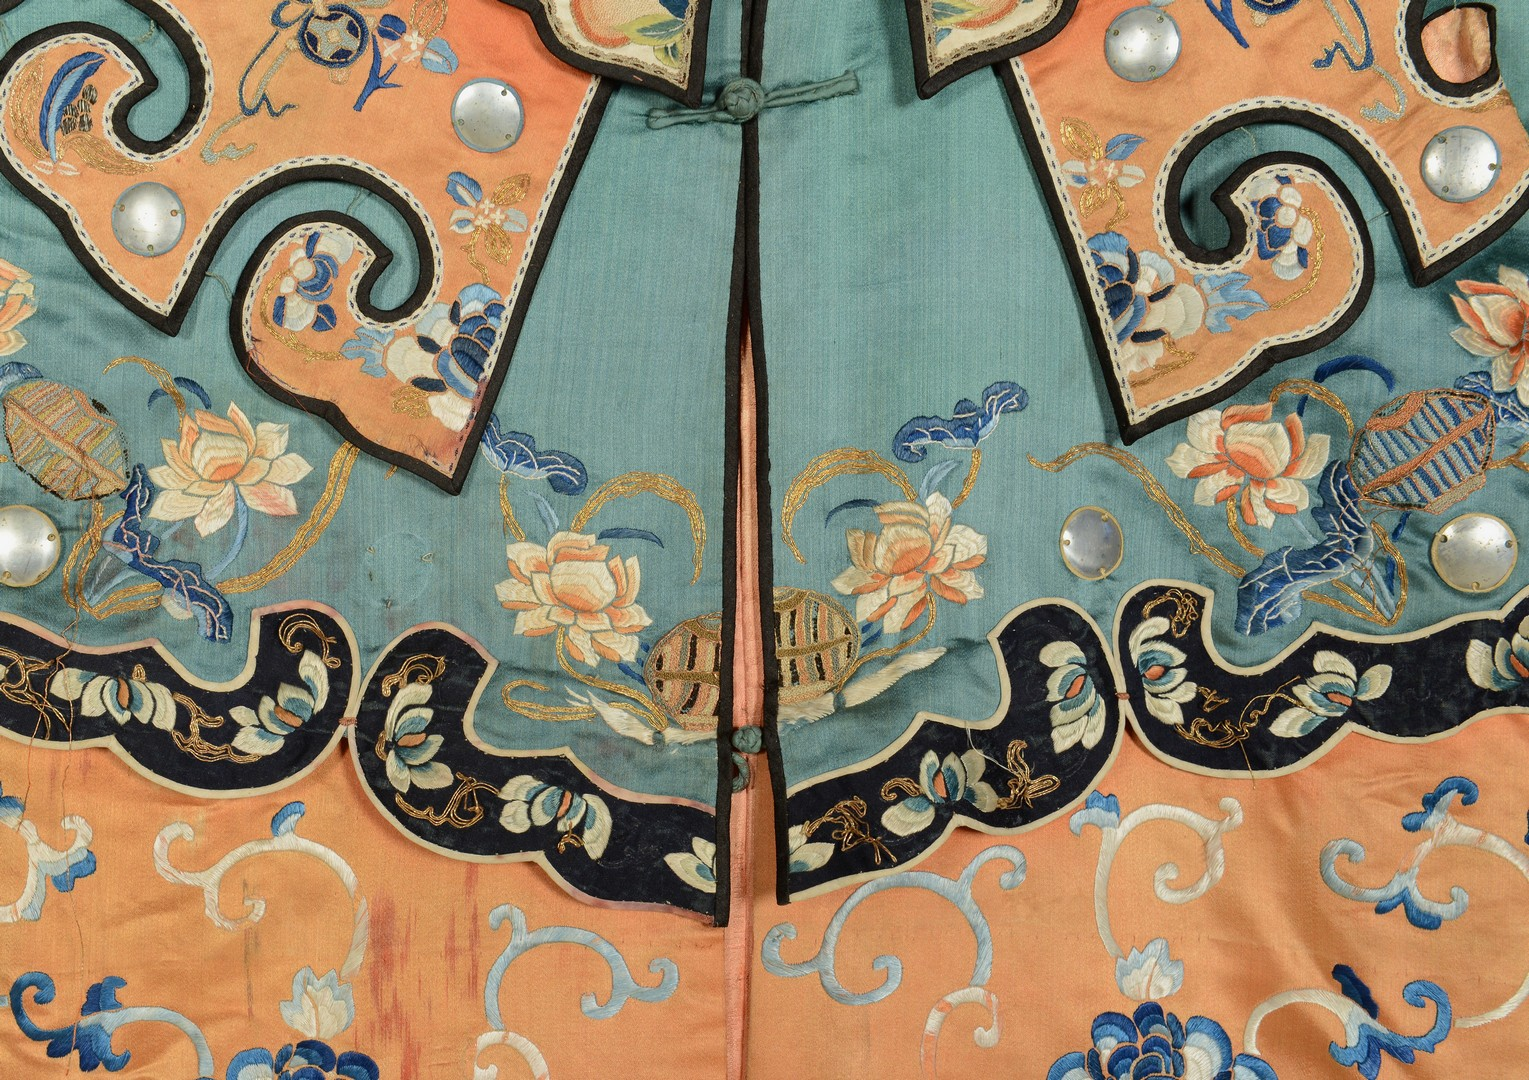 Lot 3383184: Chinese Silk Robe